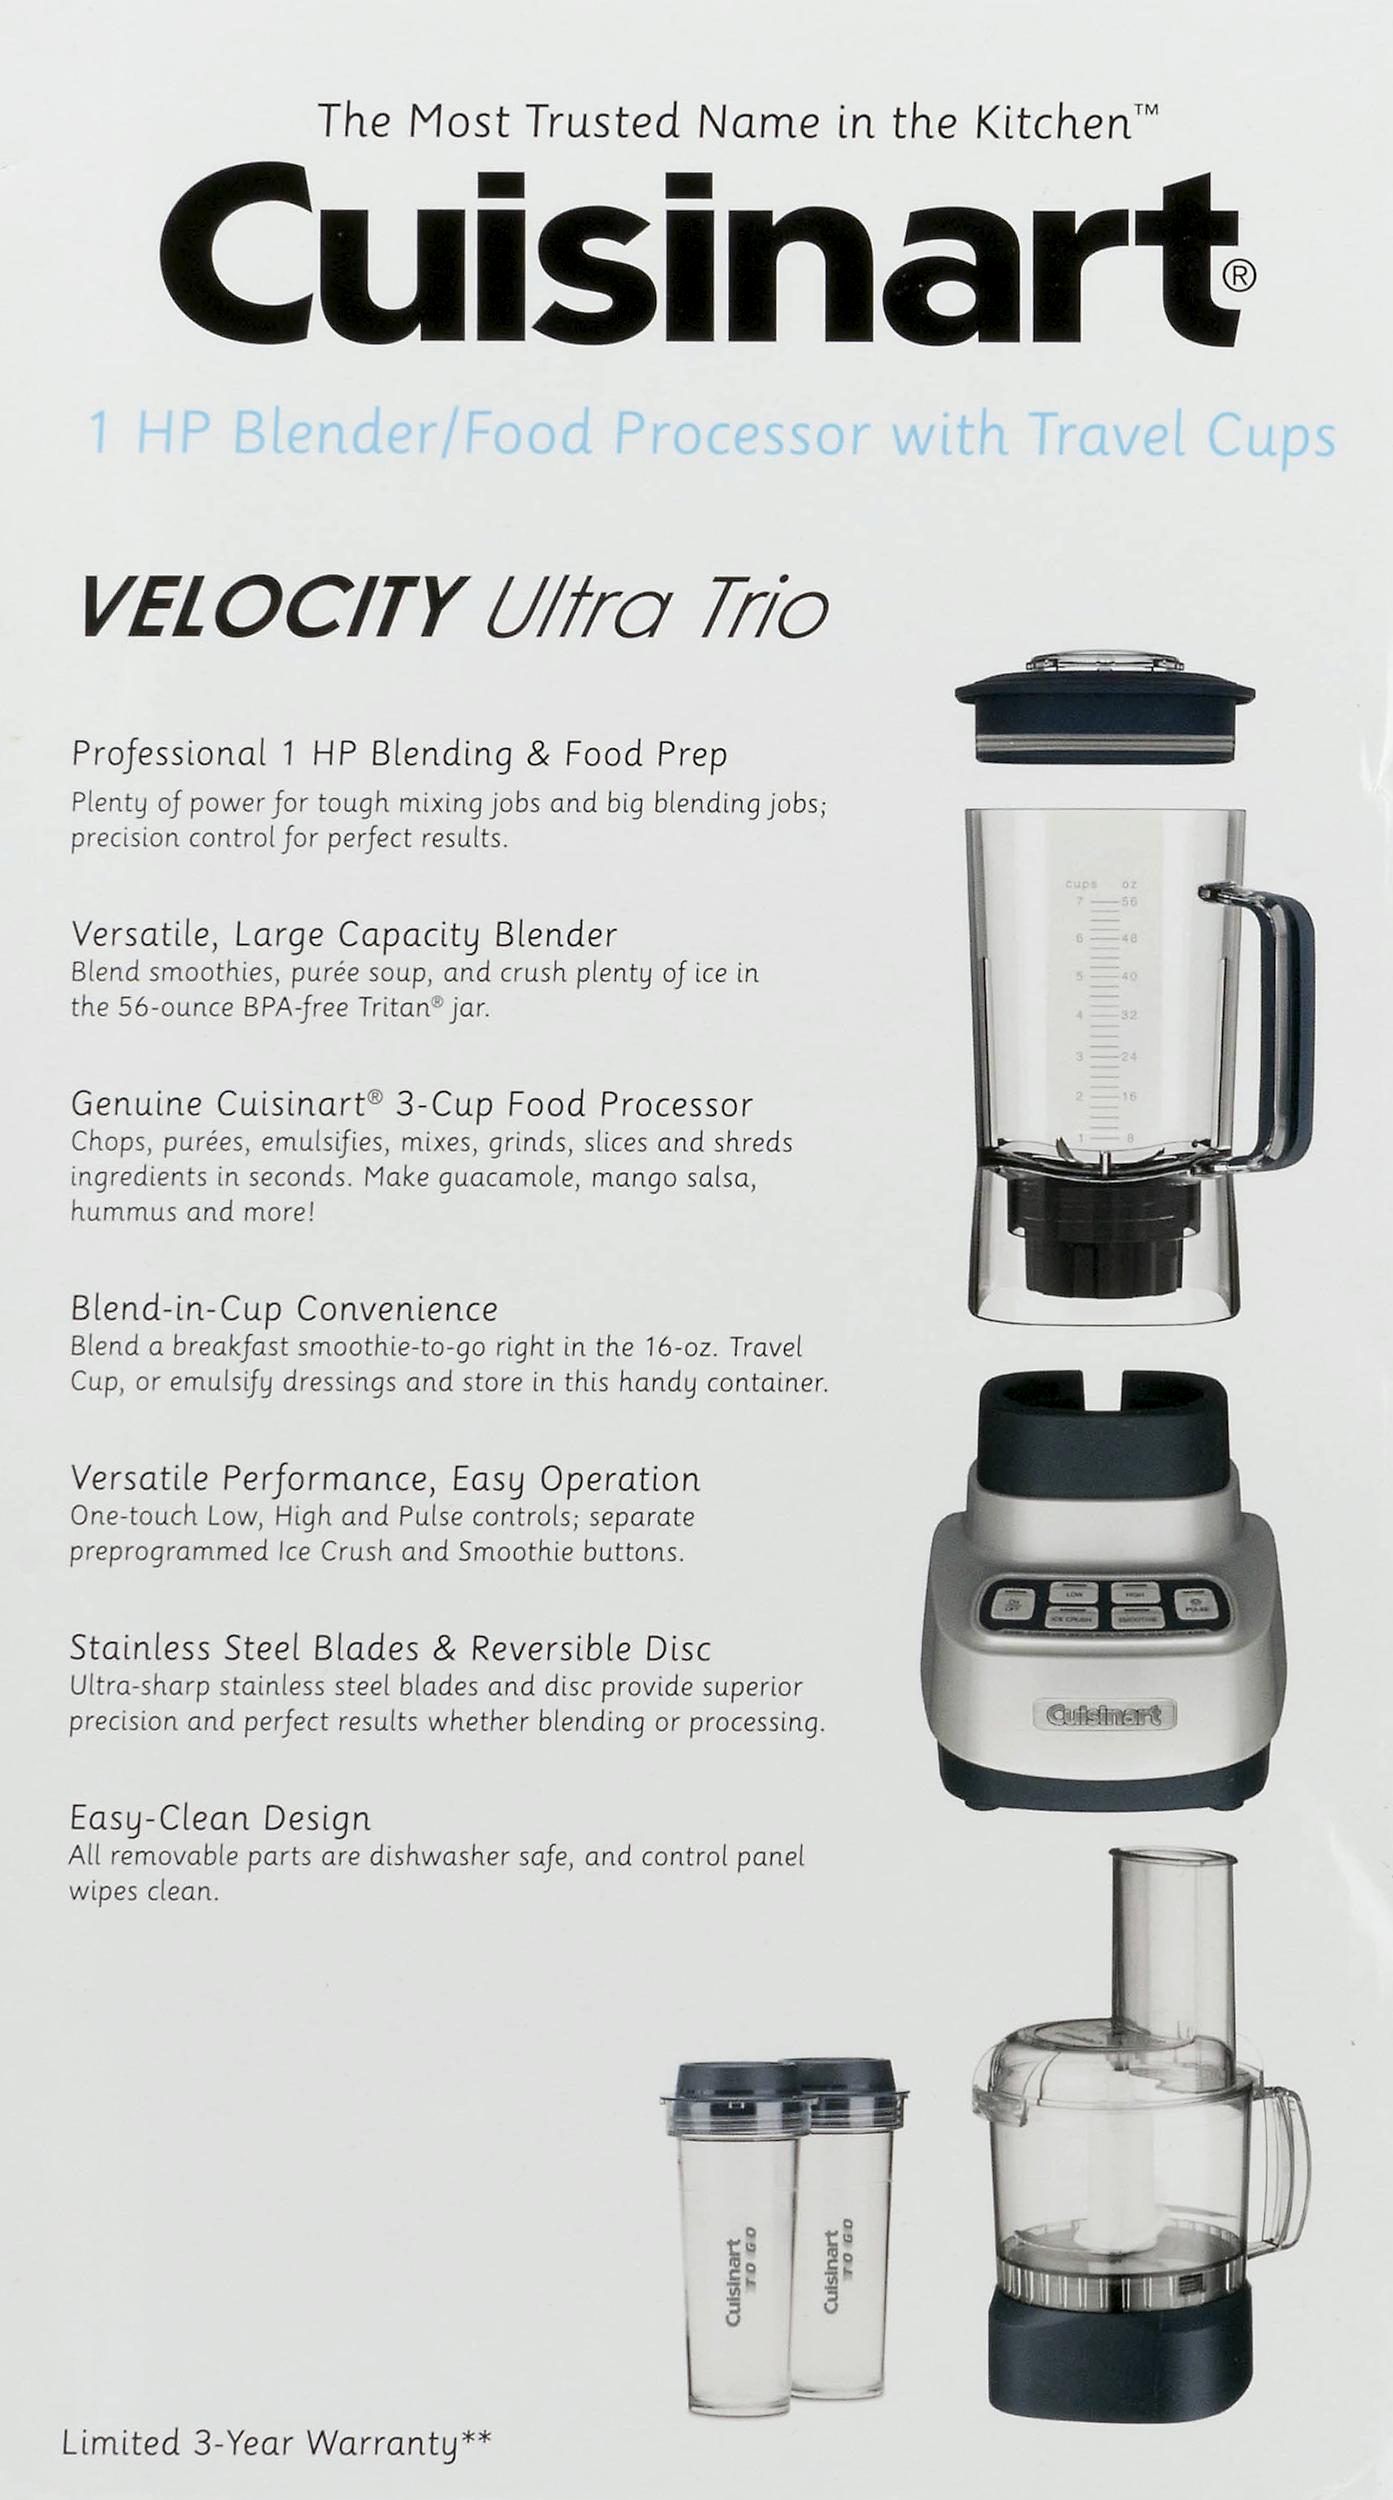 Cuisinart Velocity Ultra Trio Blender Food Processor Travel Cups Gun Metal